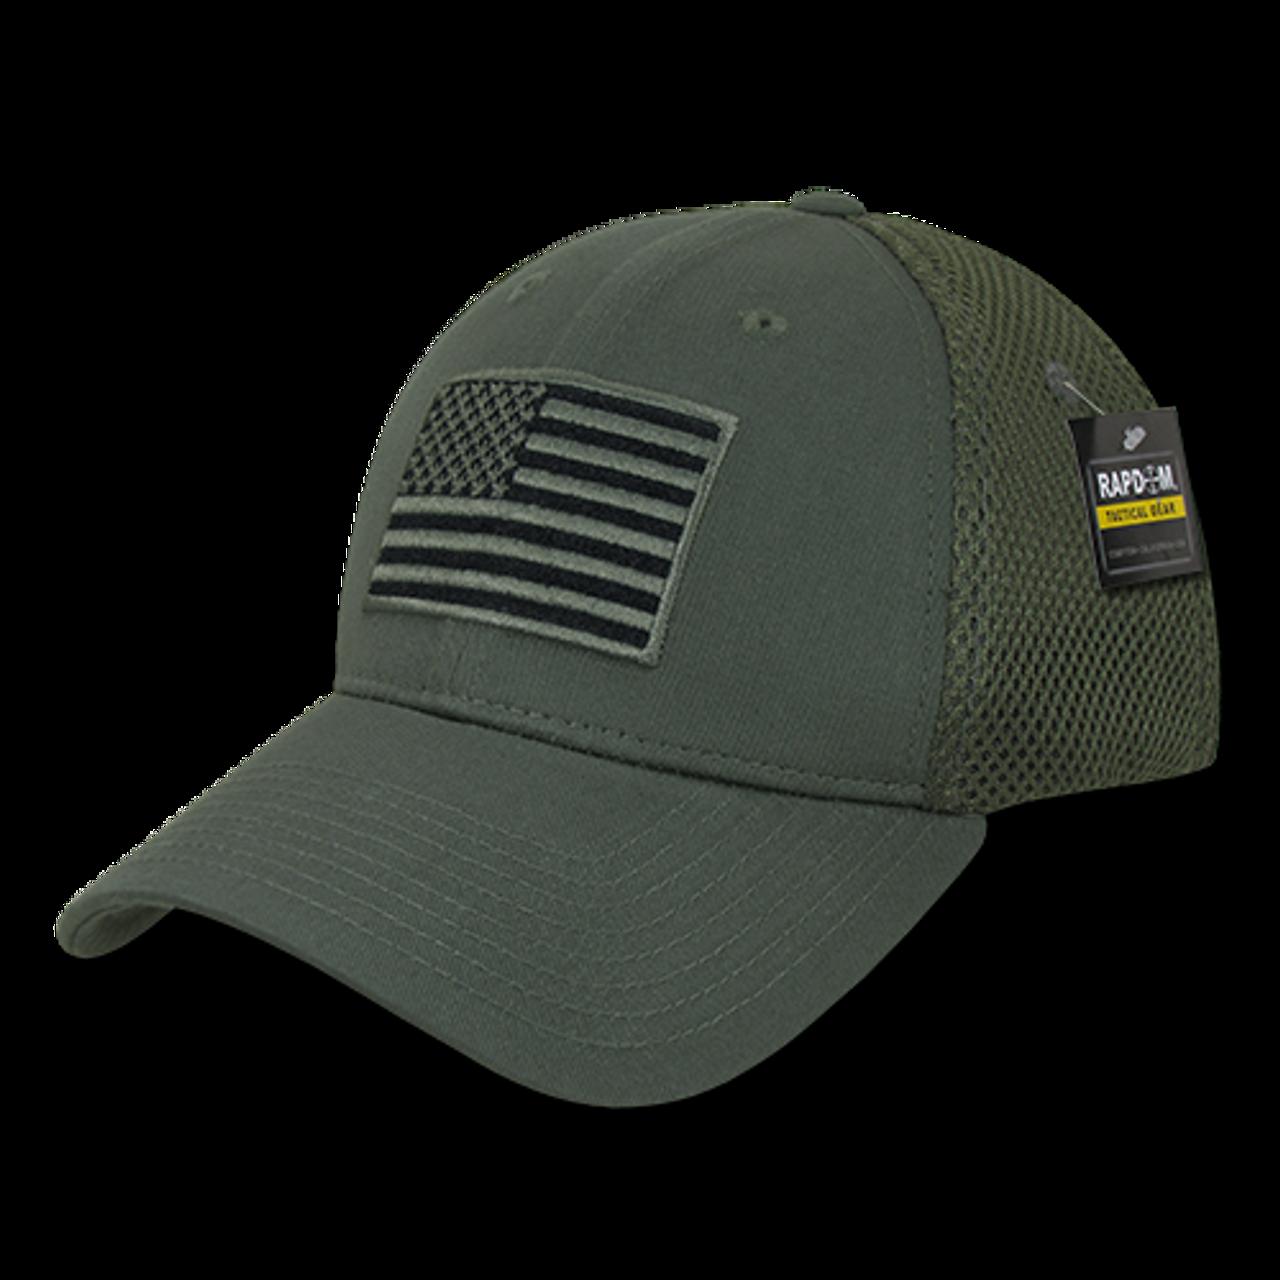 97bda5246 T88 - Tactical Cap USA Flag - Low Crown Structured Air Mesh Flex - Olive  Drab